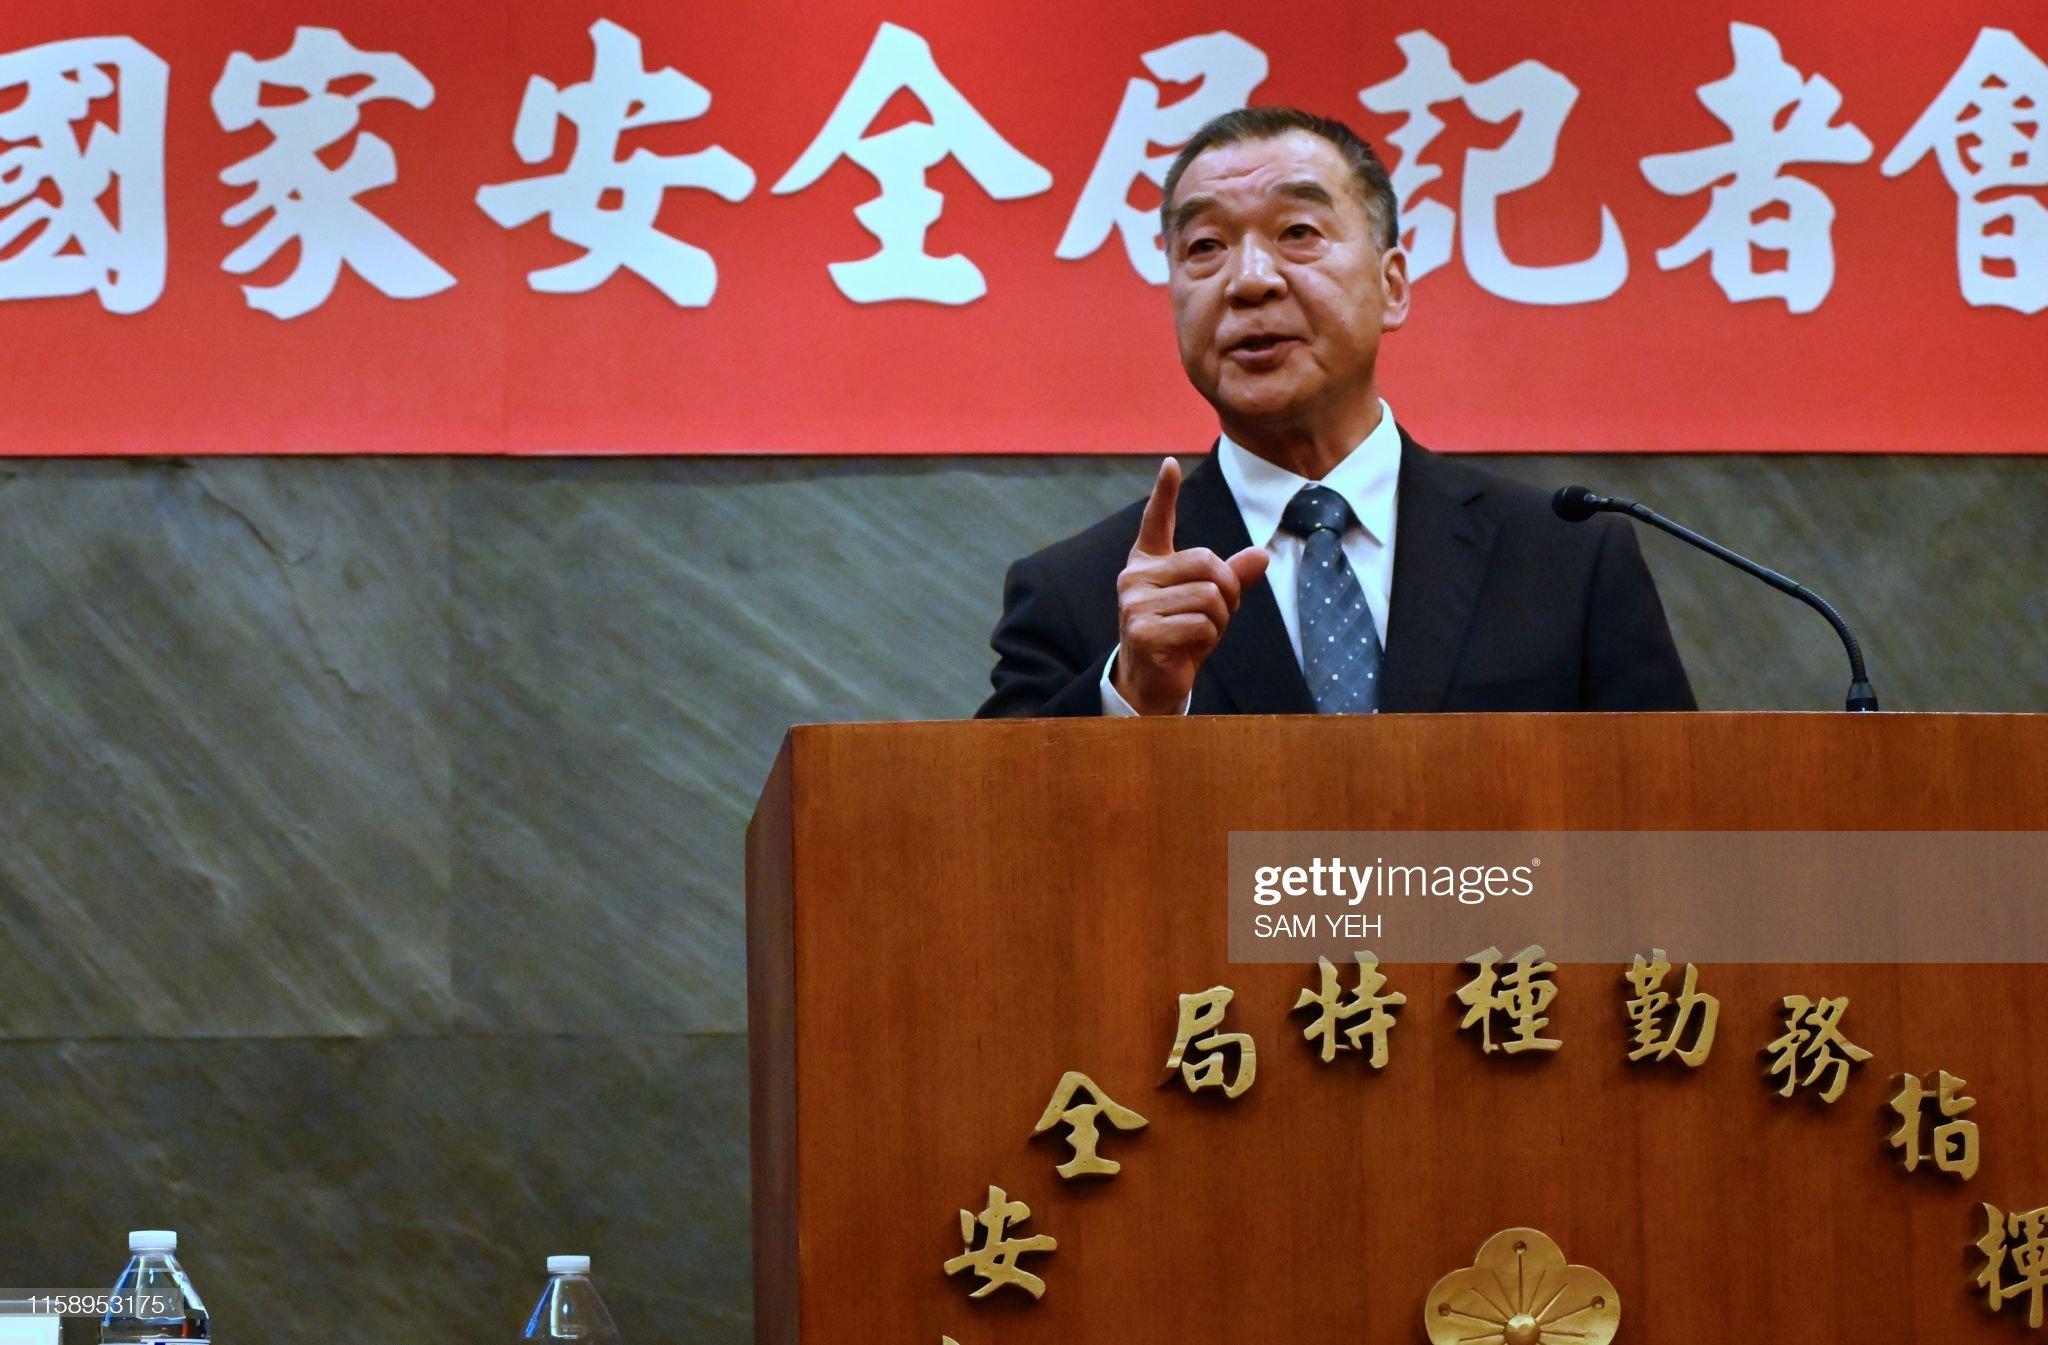 TAIWAN-POLITICS-CRIME : News Photo